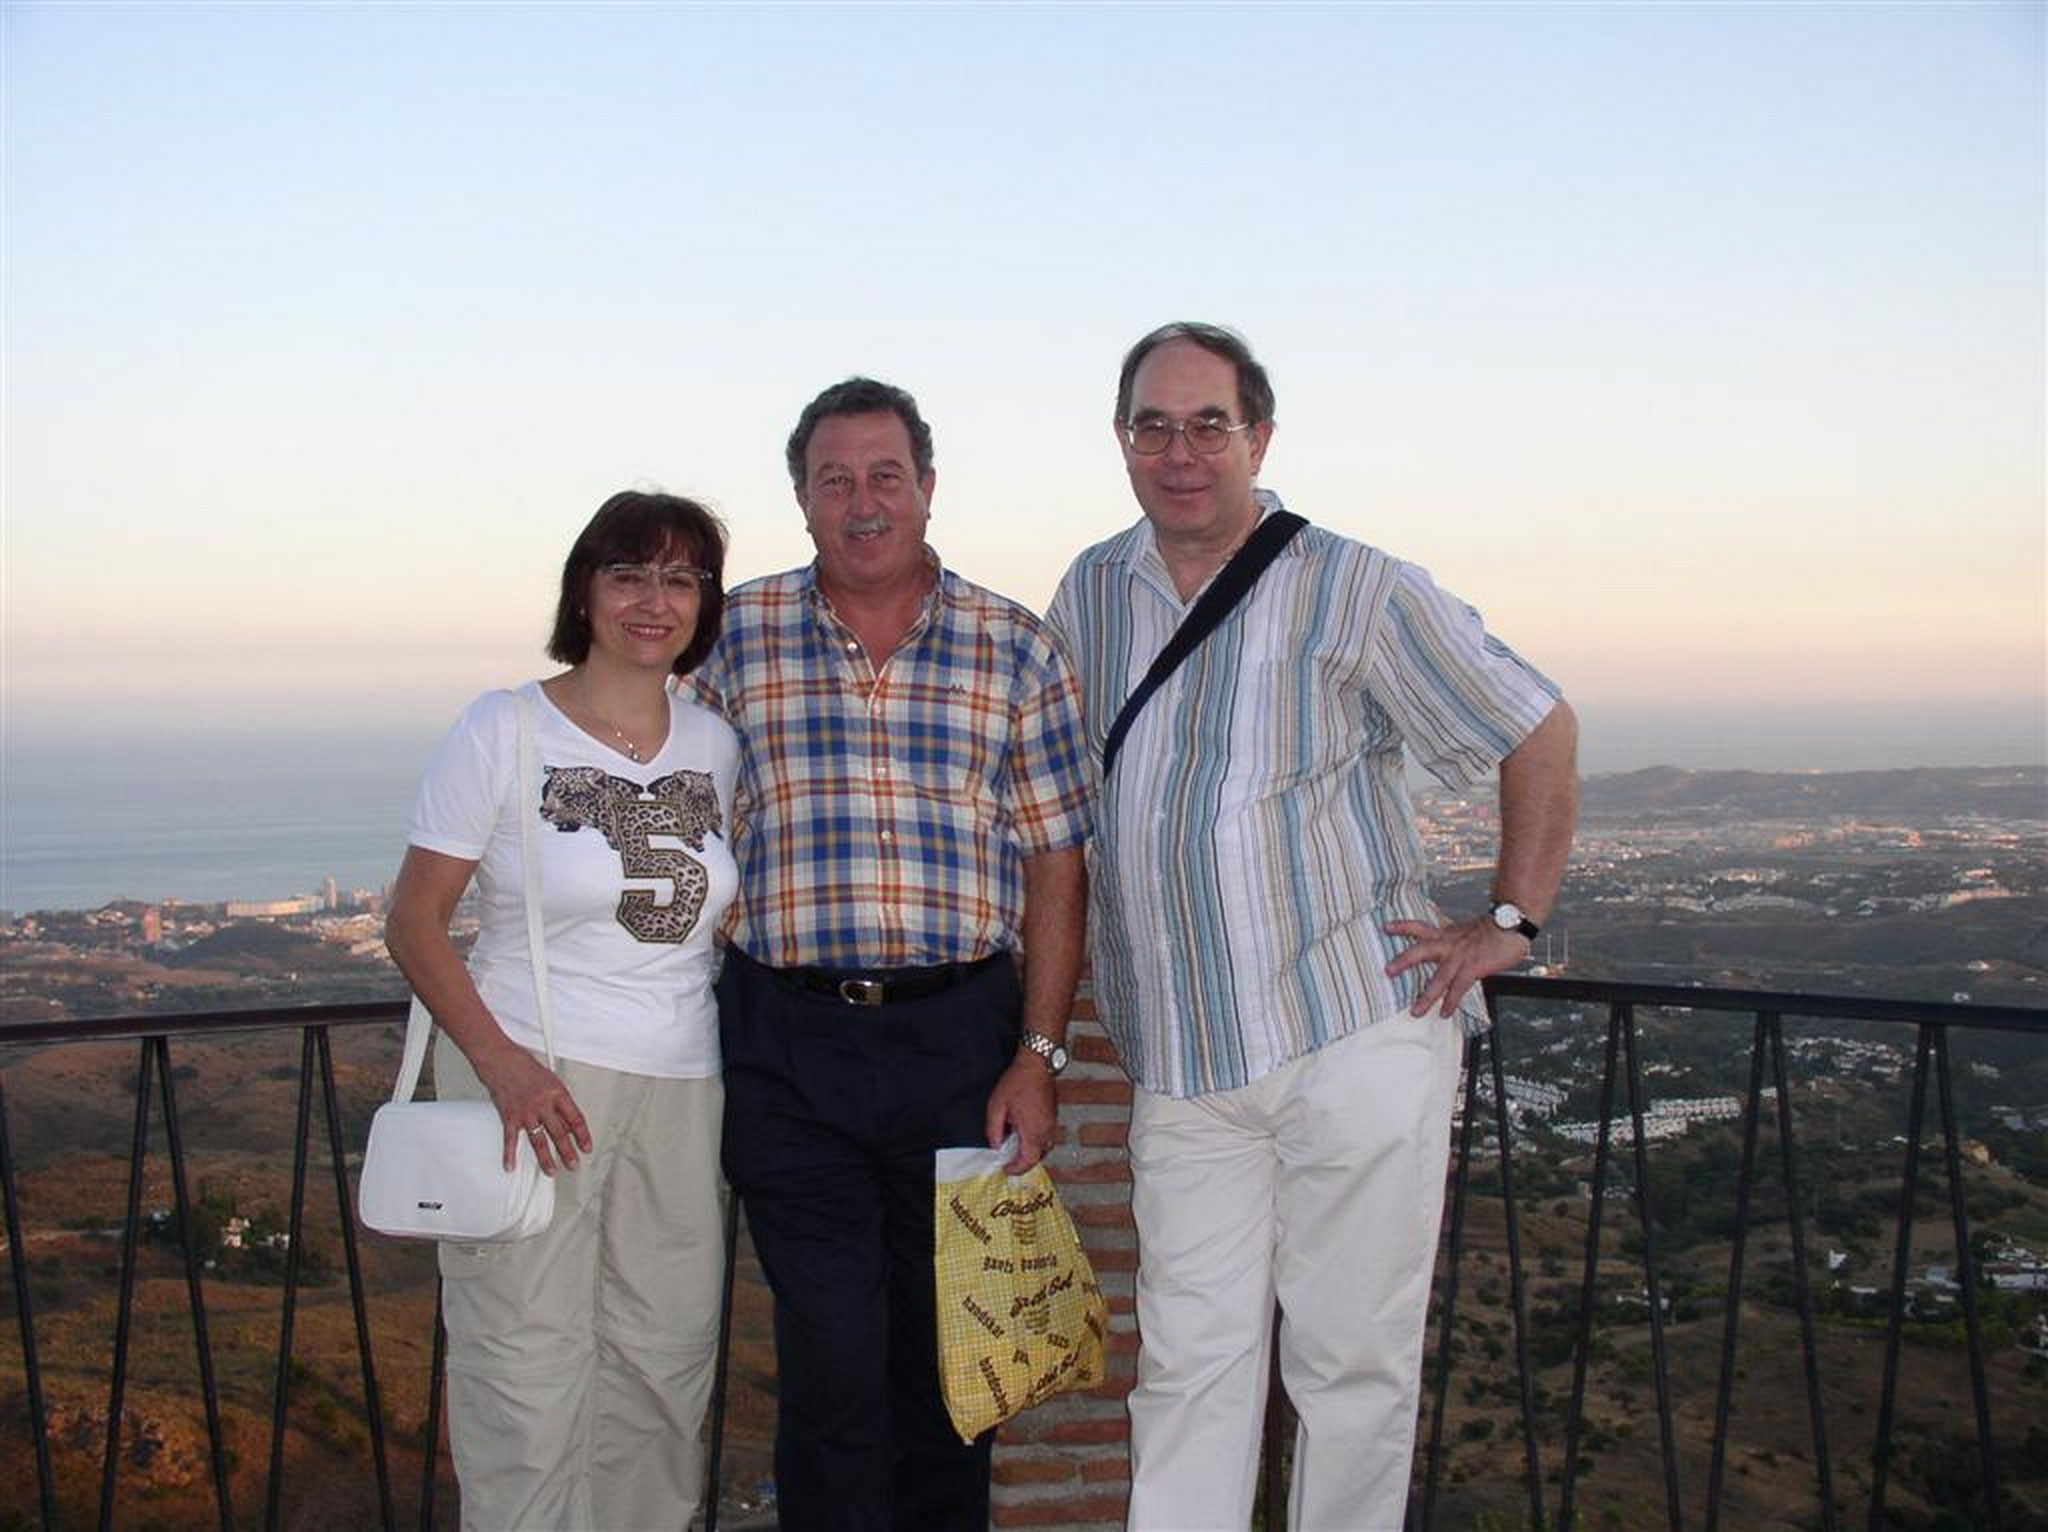 Meeting with Jose Luis Conde in Malaga and Torremolinos 2004